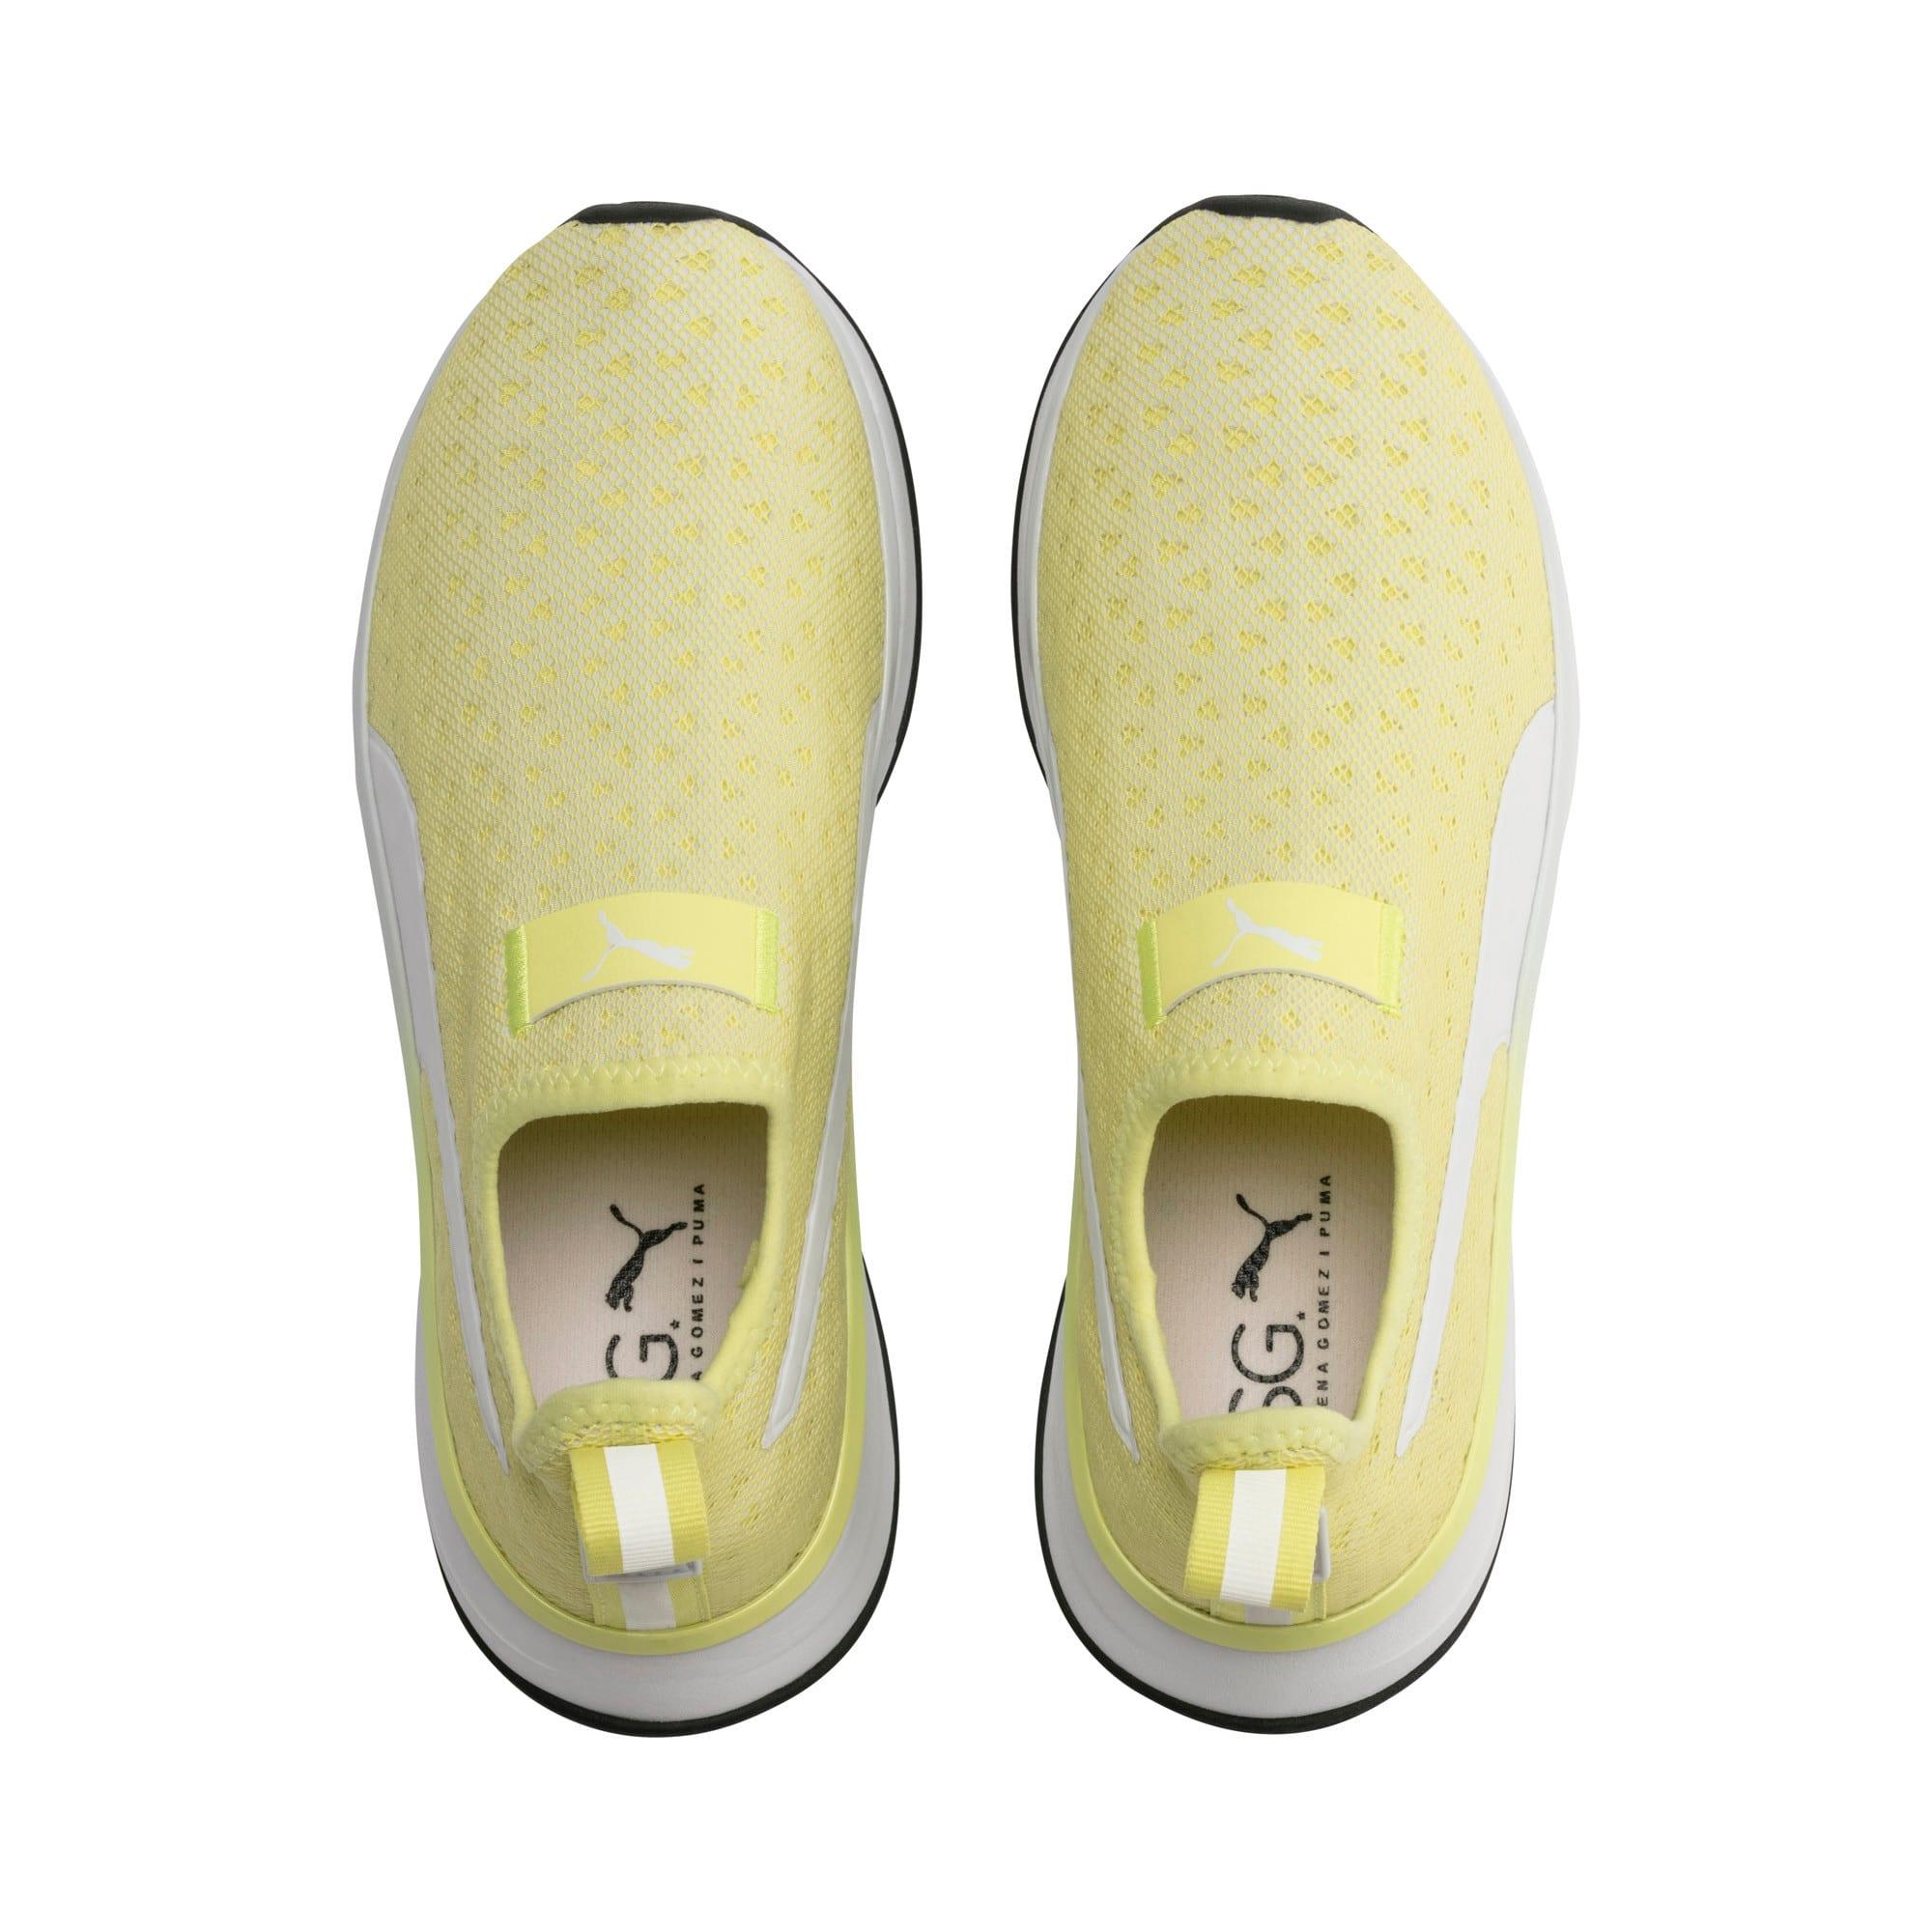 Thumbnail 7 of PUMA x SELENA GOMEZ Slip-On Women's Training Shoes, YELLOW-Puma White-Puma Black, medium